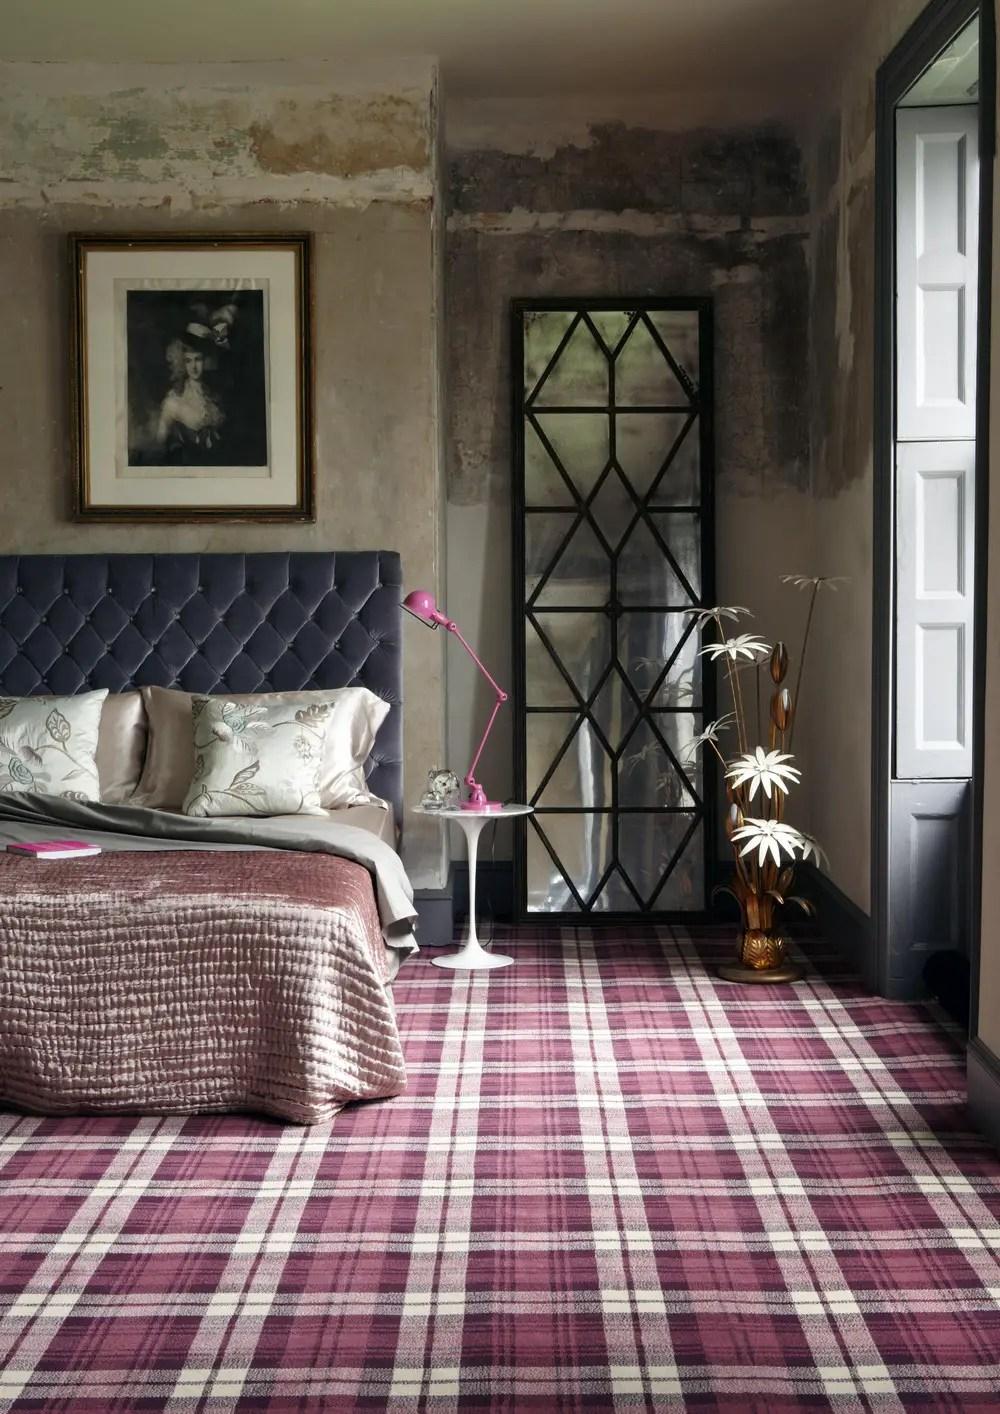 Scottish Tartan Home Interior Design | www.glasgowarchitecture.co.uk